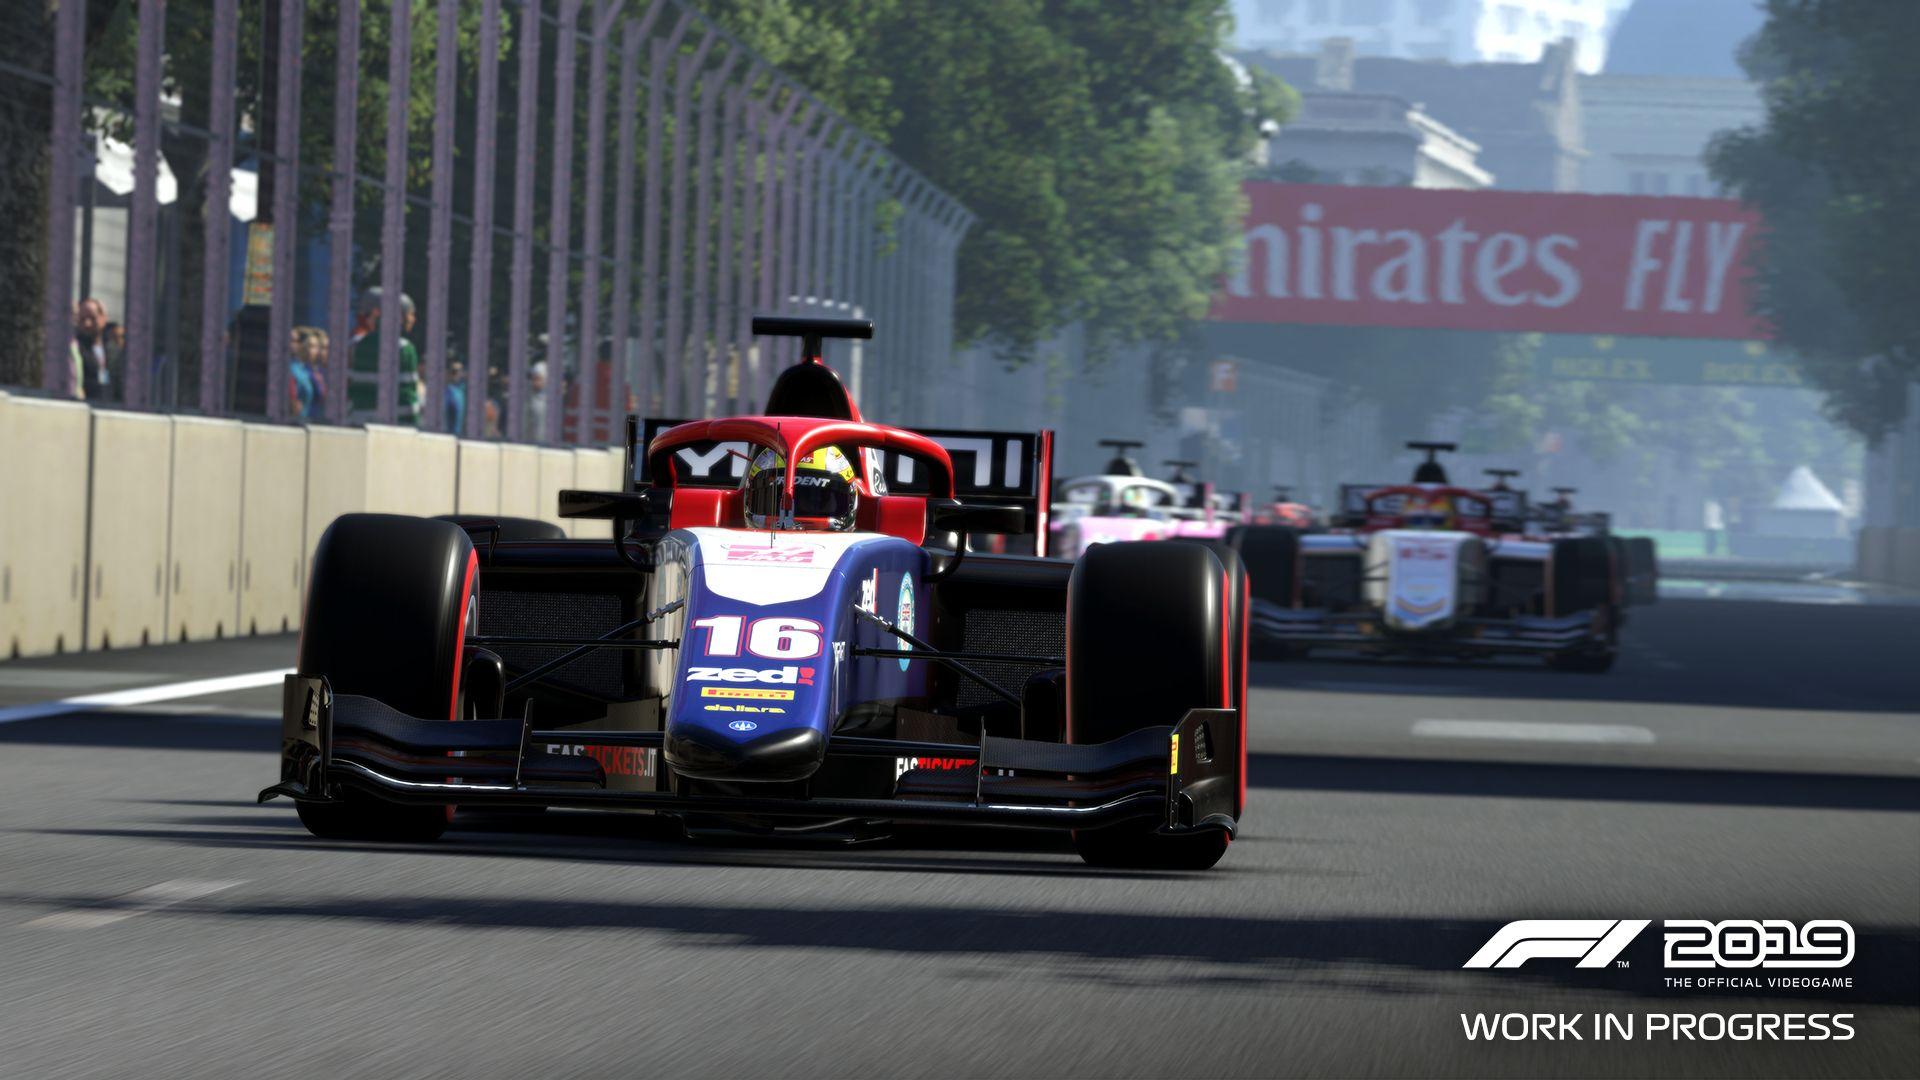 F120193